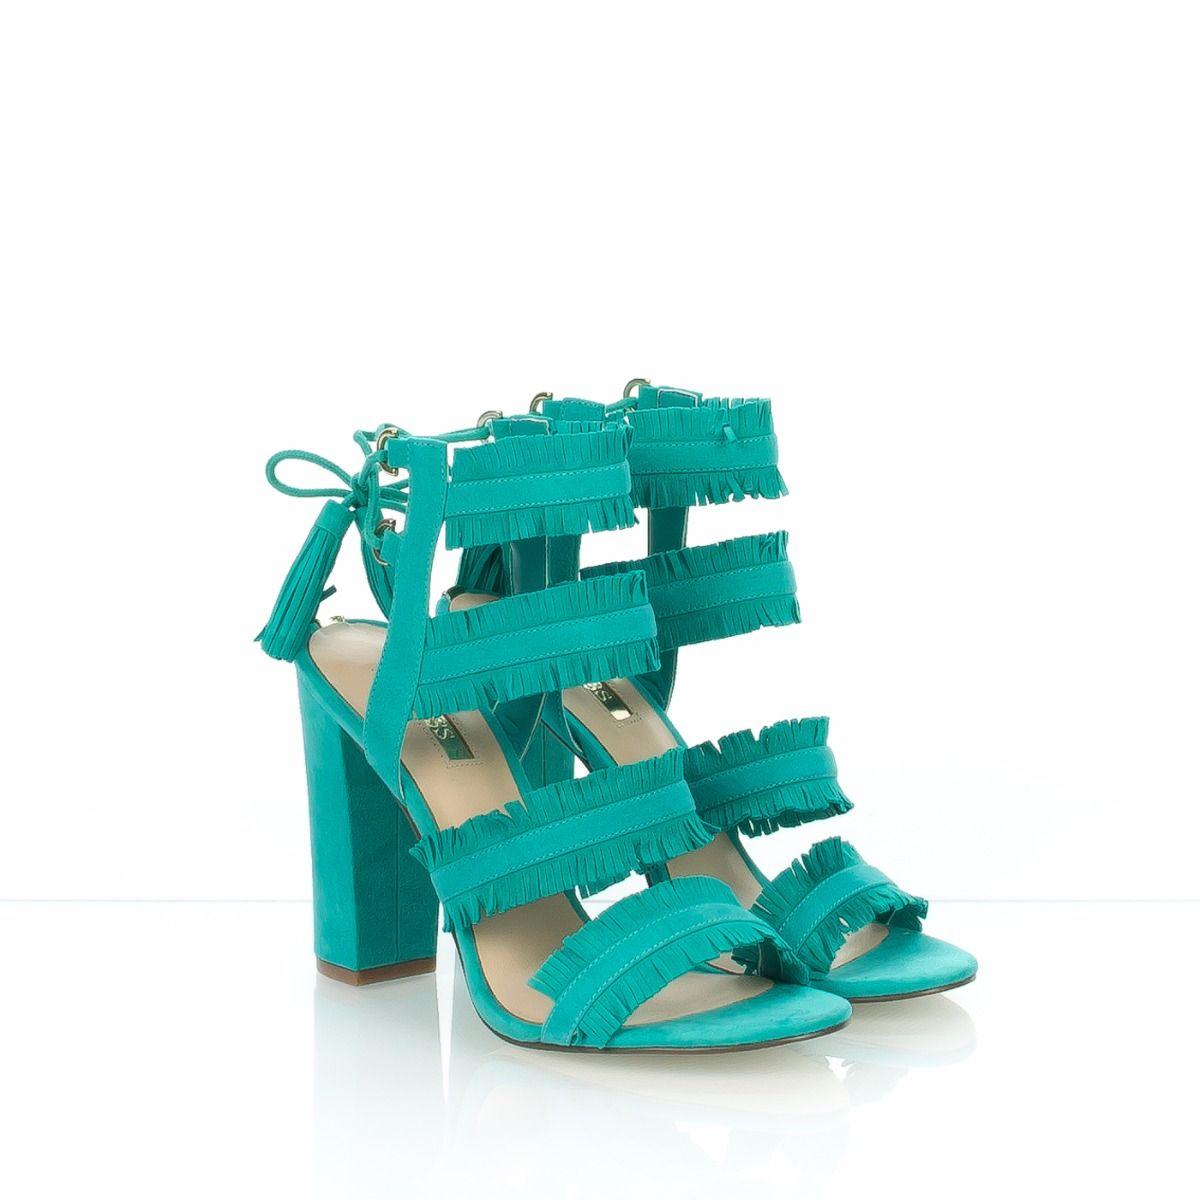 Guess Fleco1 Sandalo Donna Pon Turchese dtsQCxhrB